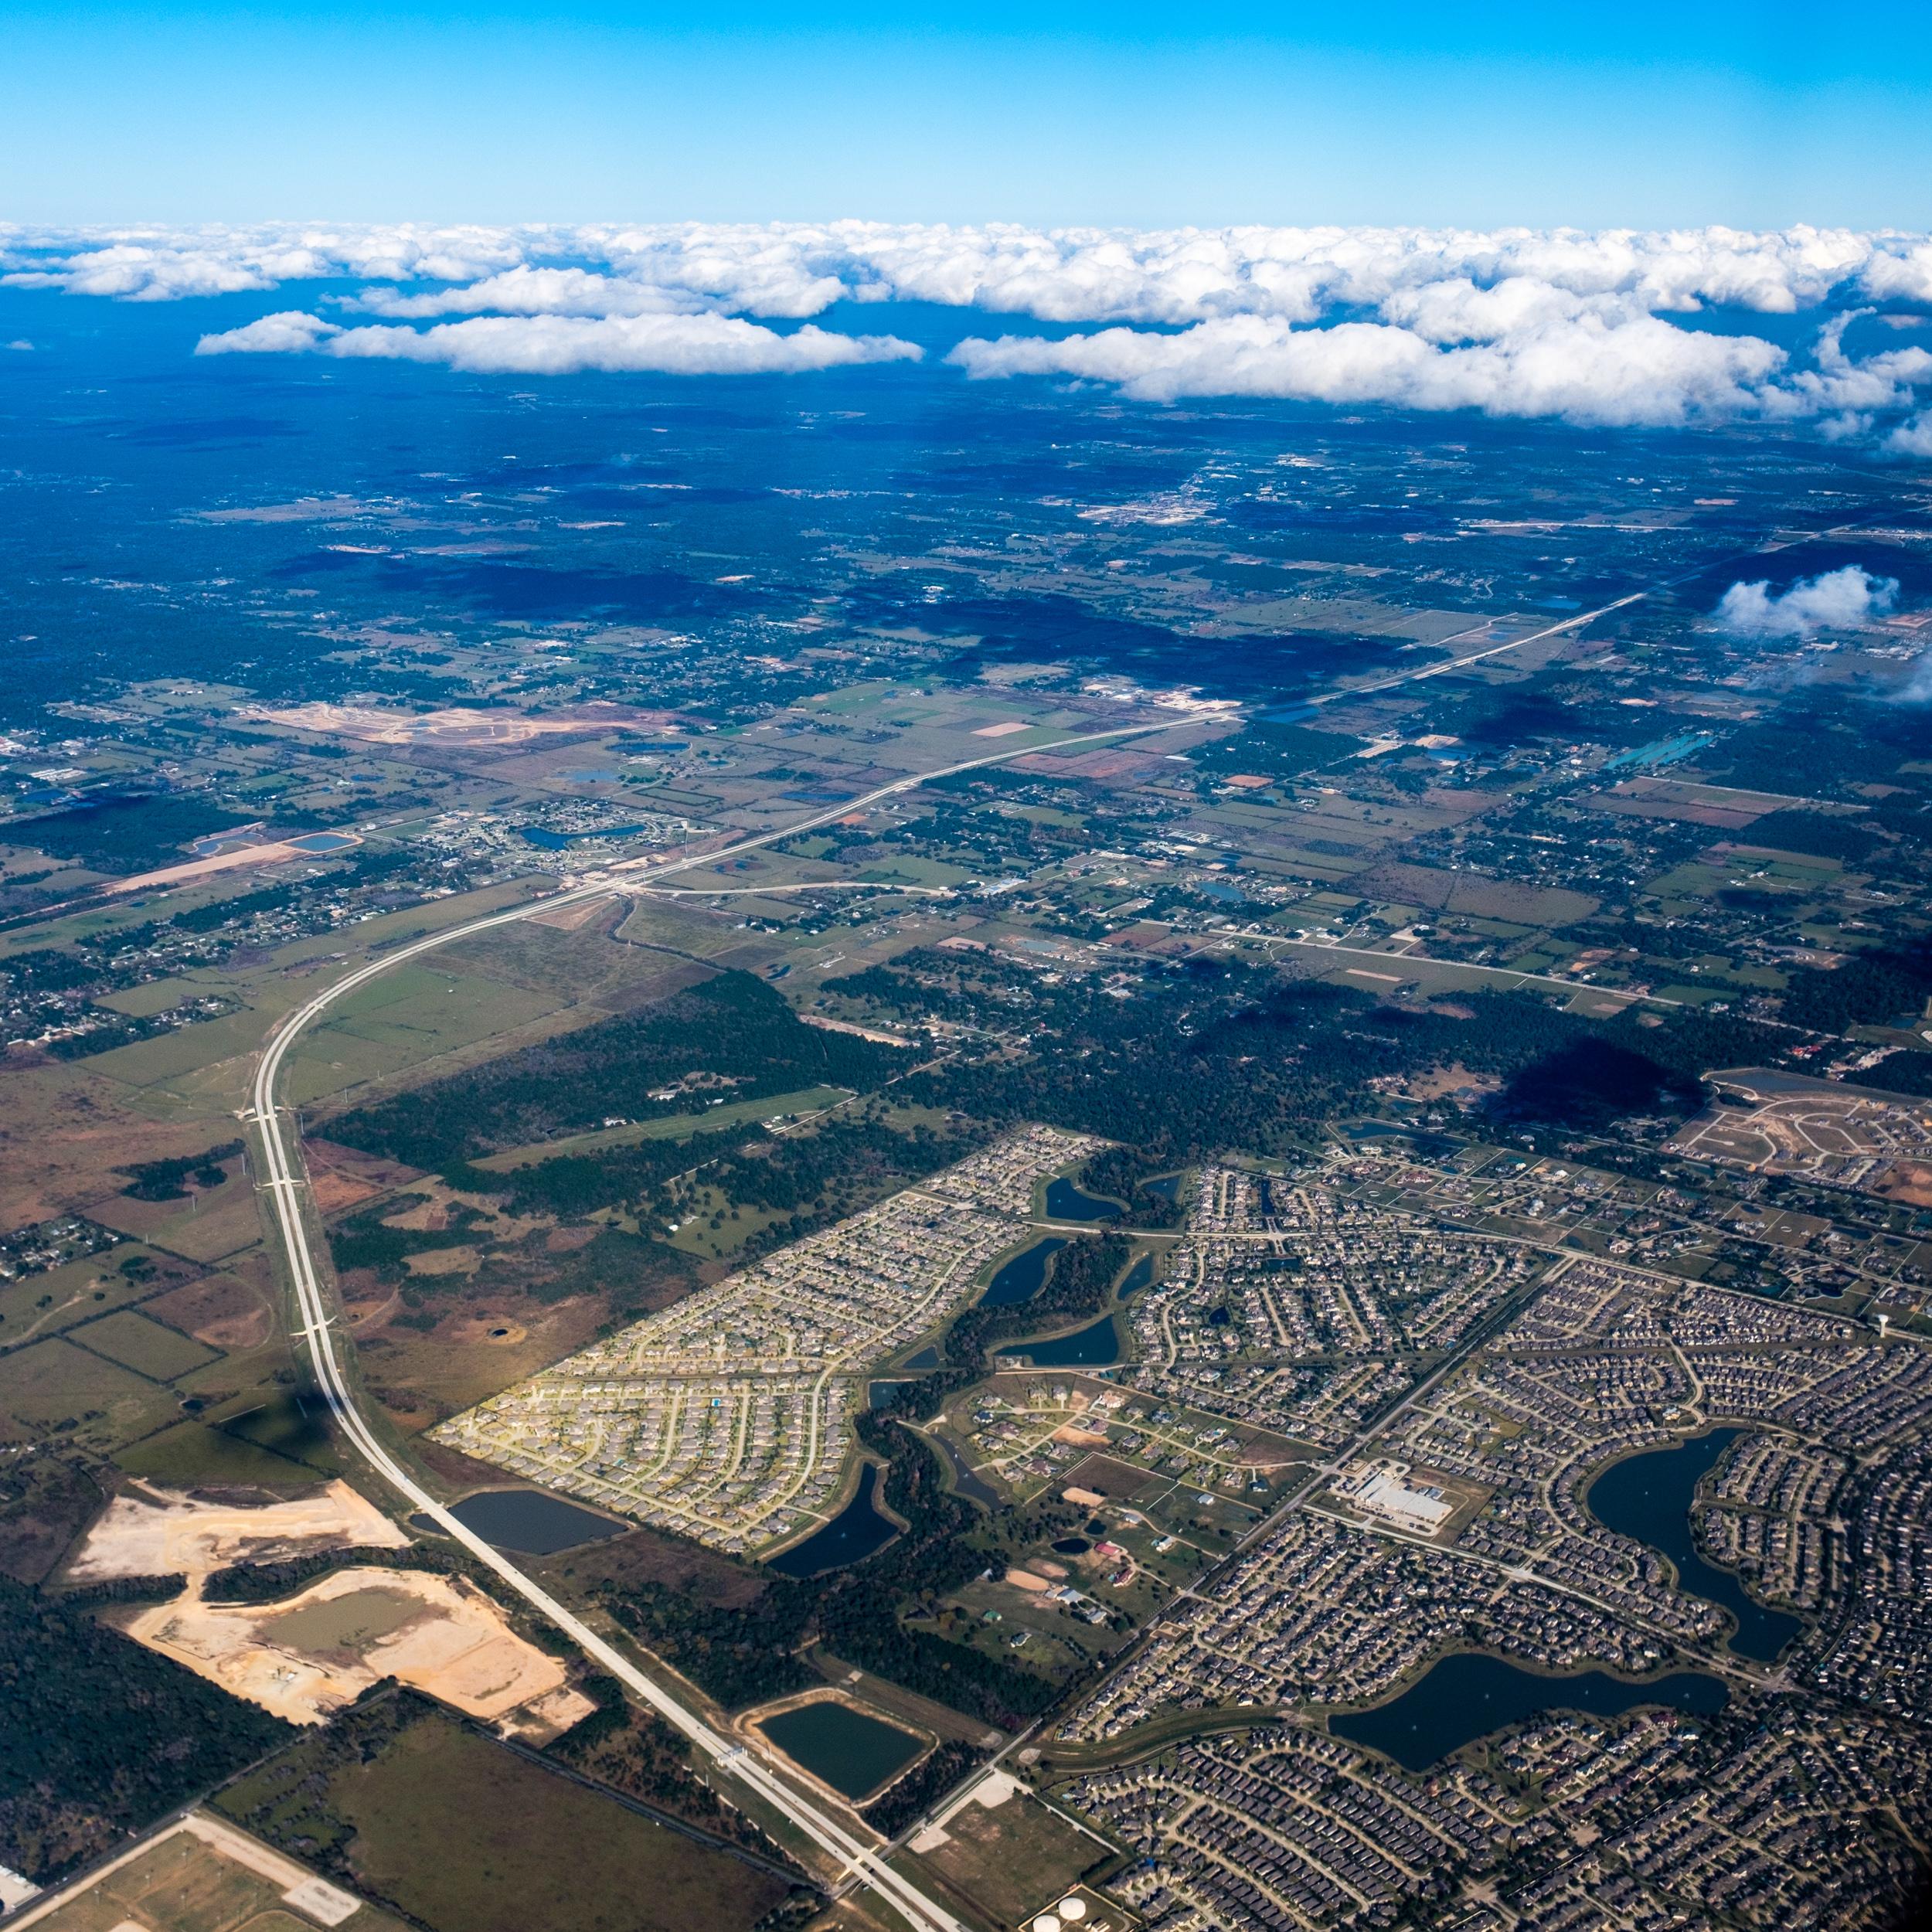 Aerials for Bannon 2019 (2.5k)-12.jpg